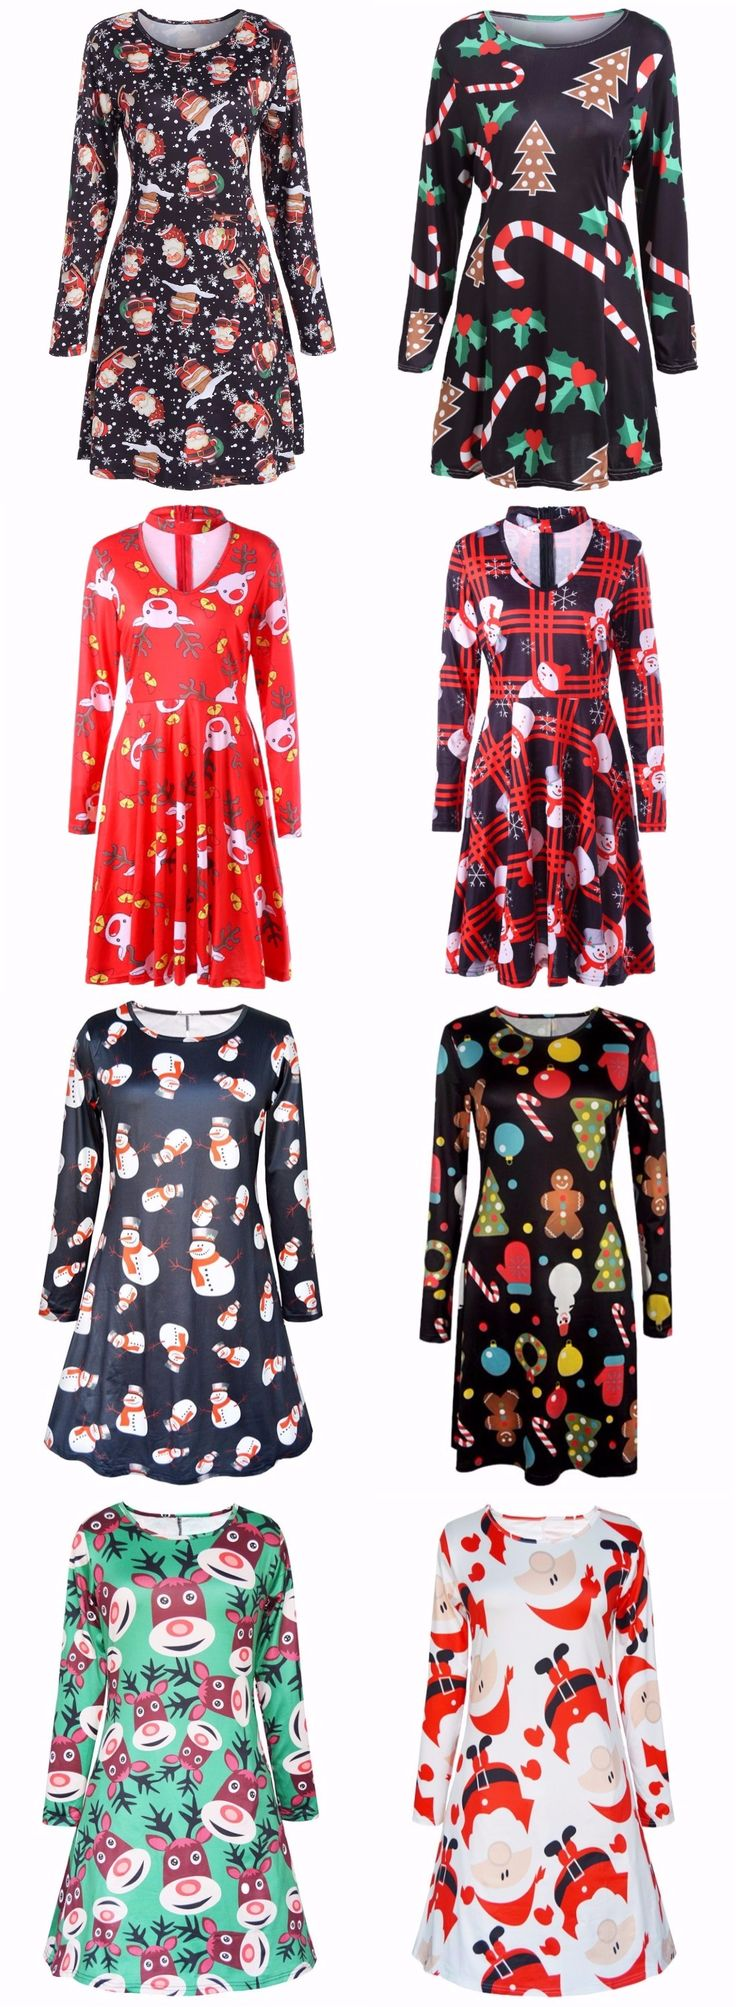 Merry Christmas Dress| Start at only $10 | Party Dress | Christmas Idea| Print Dress| Swing Dress | Snowflake Dress| Snowman Dress| Vintage Dress| Sammydress.com